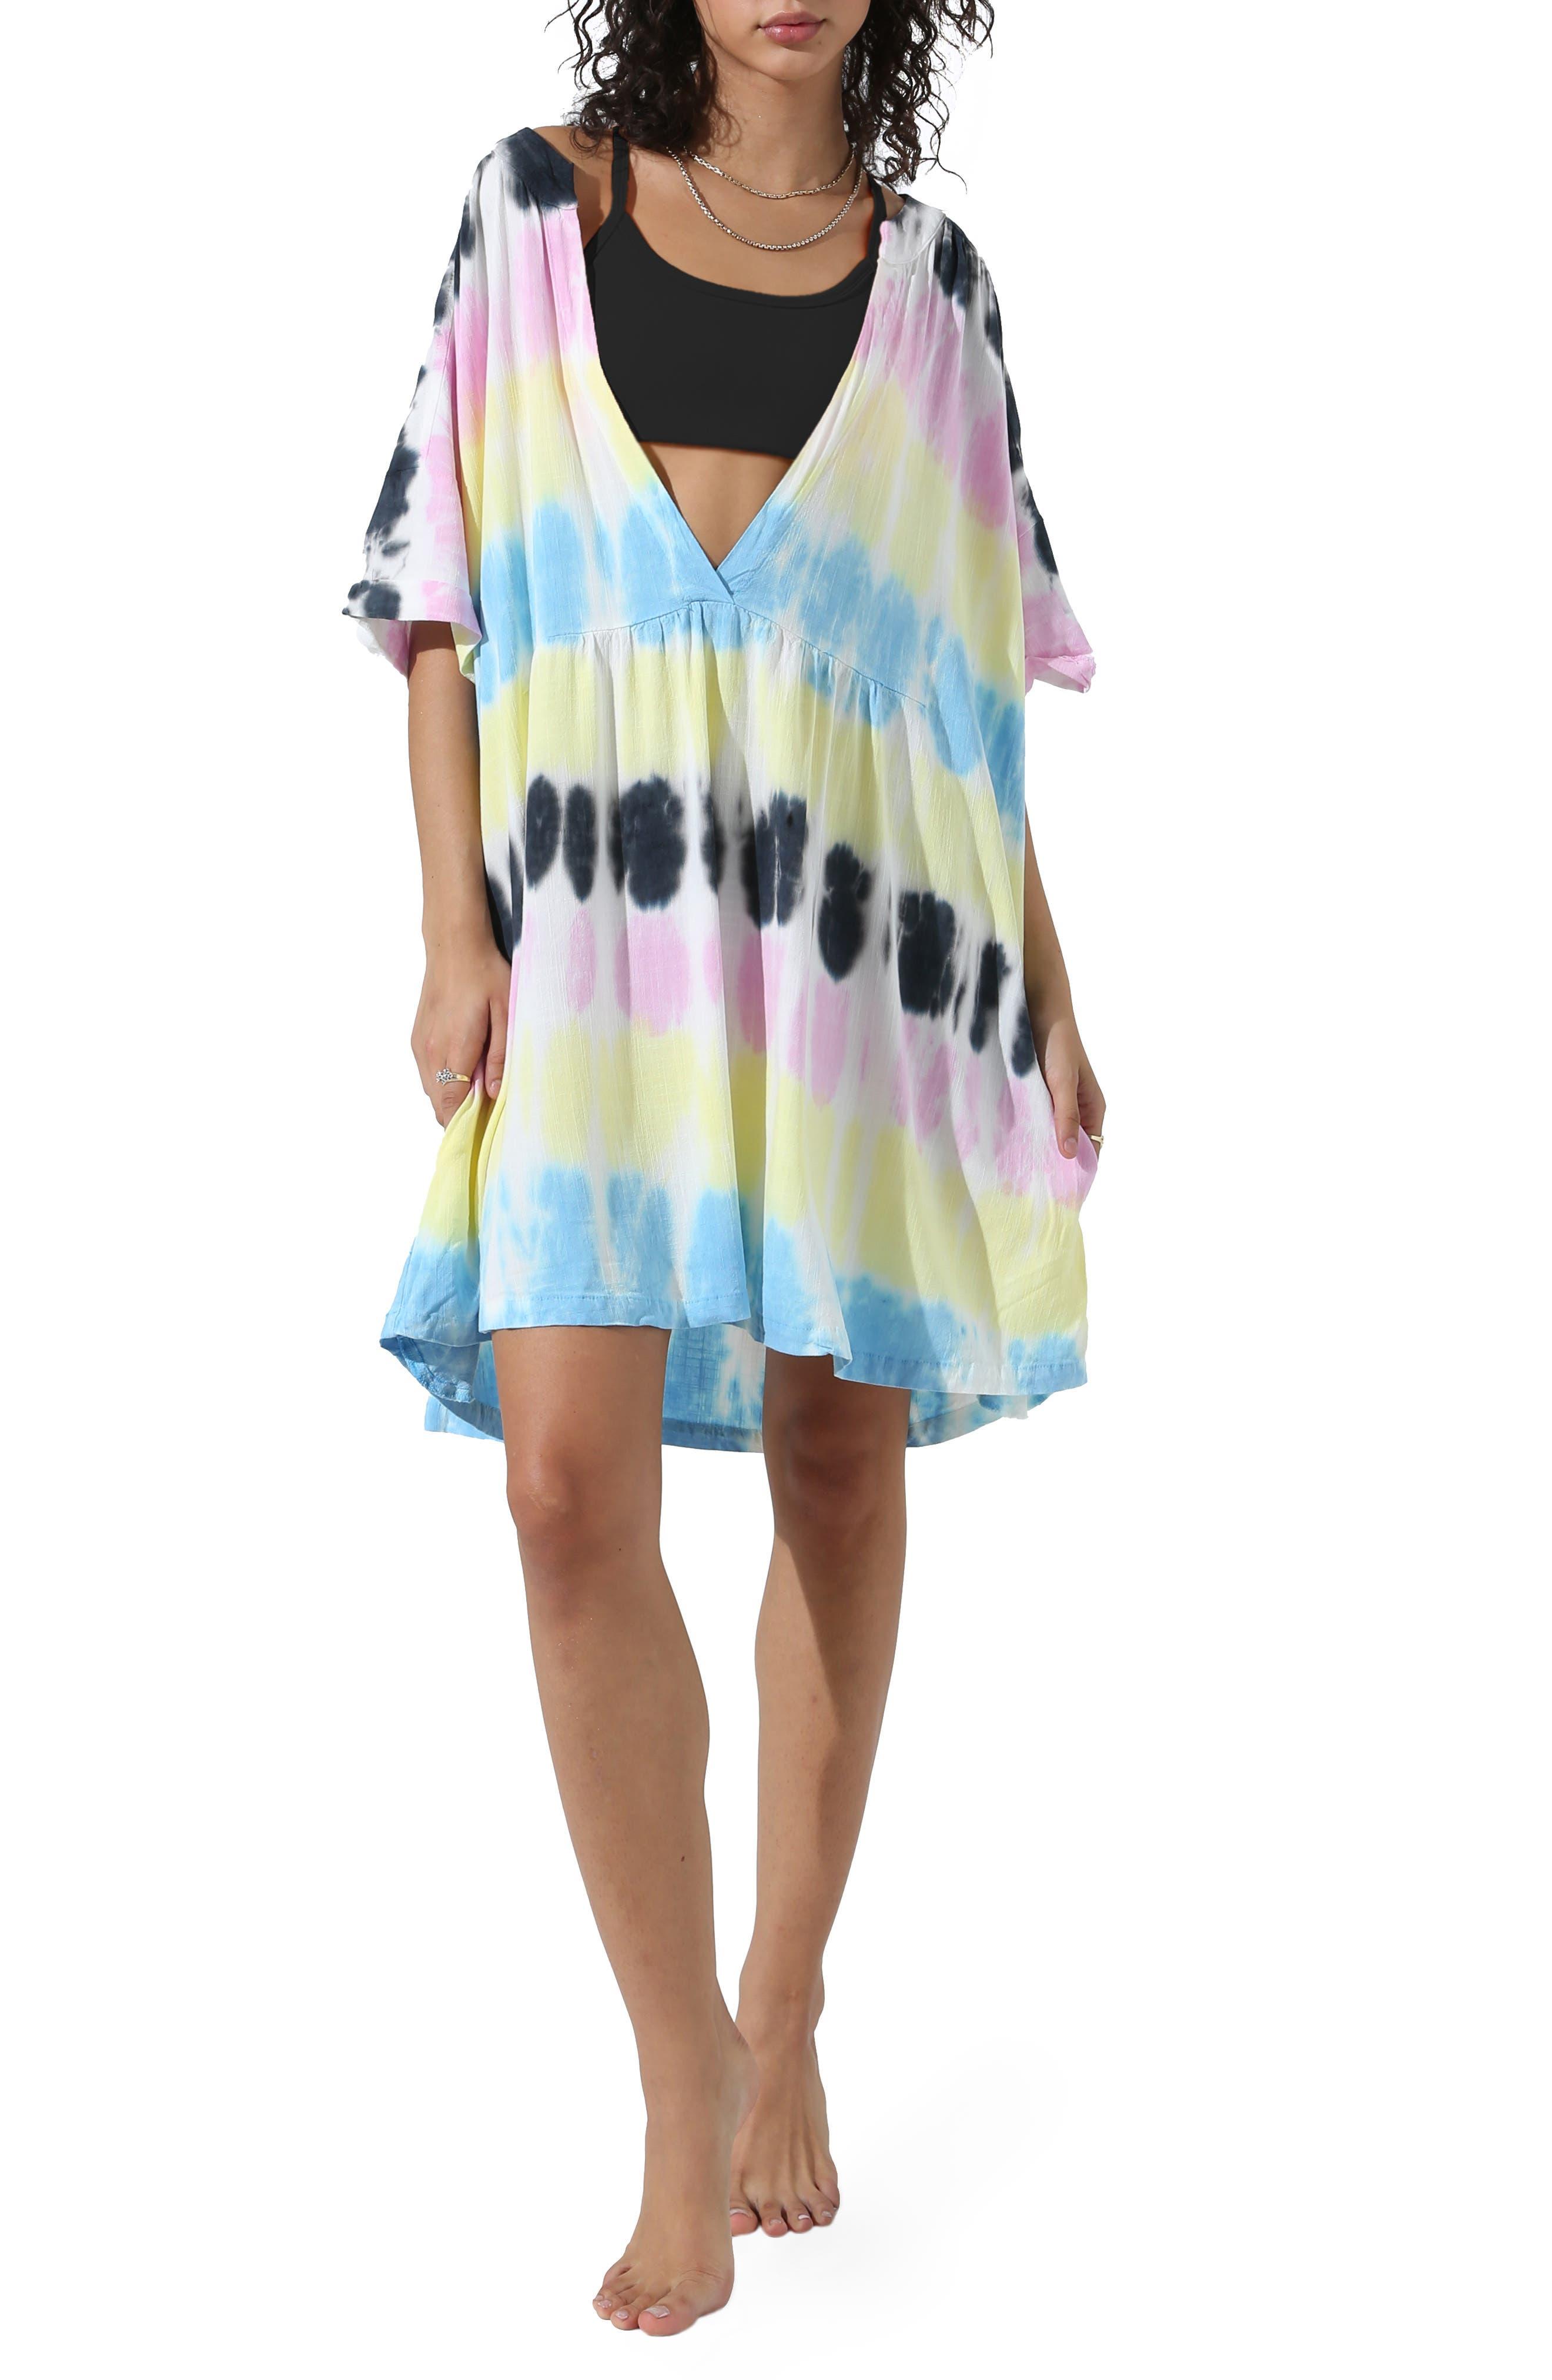 Ivy Mirage Dress